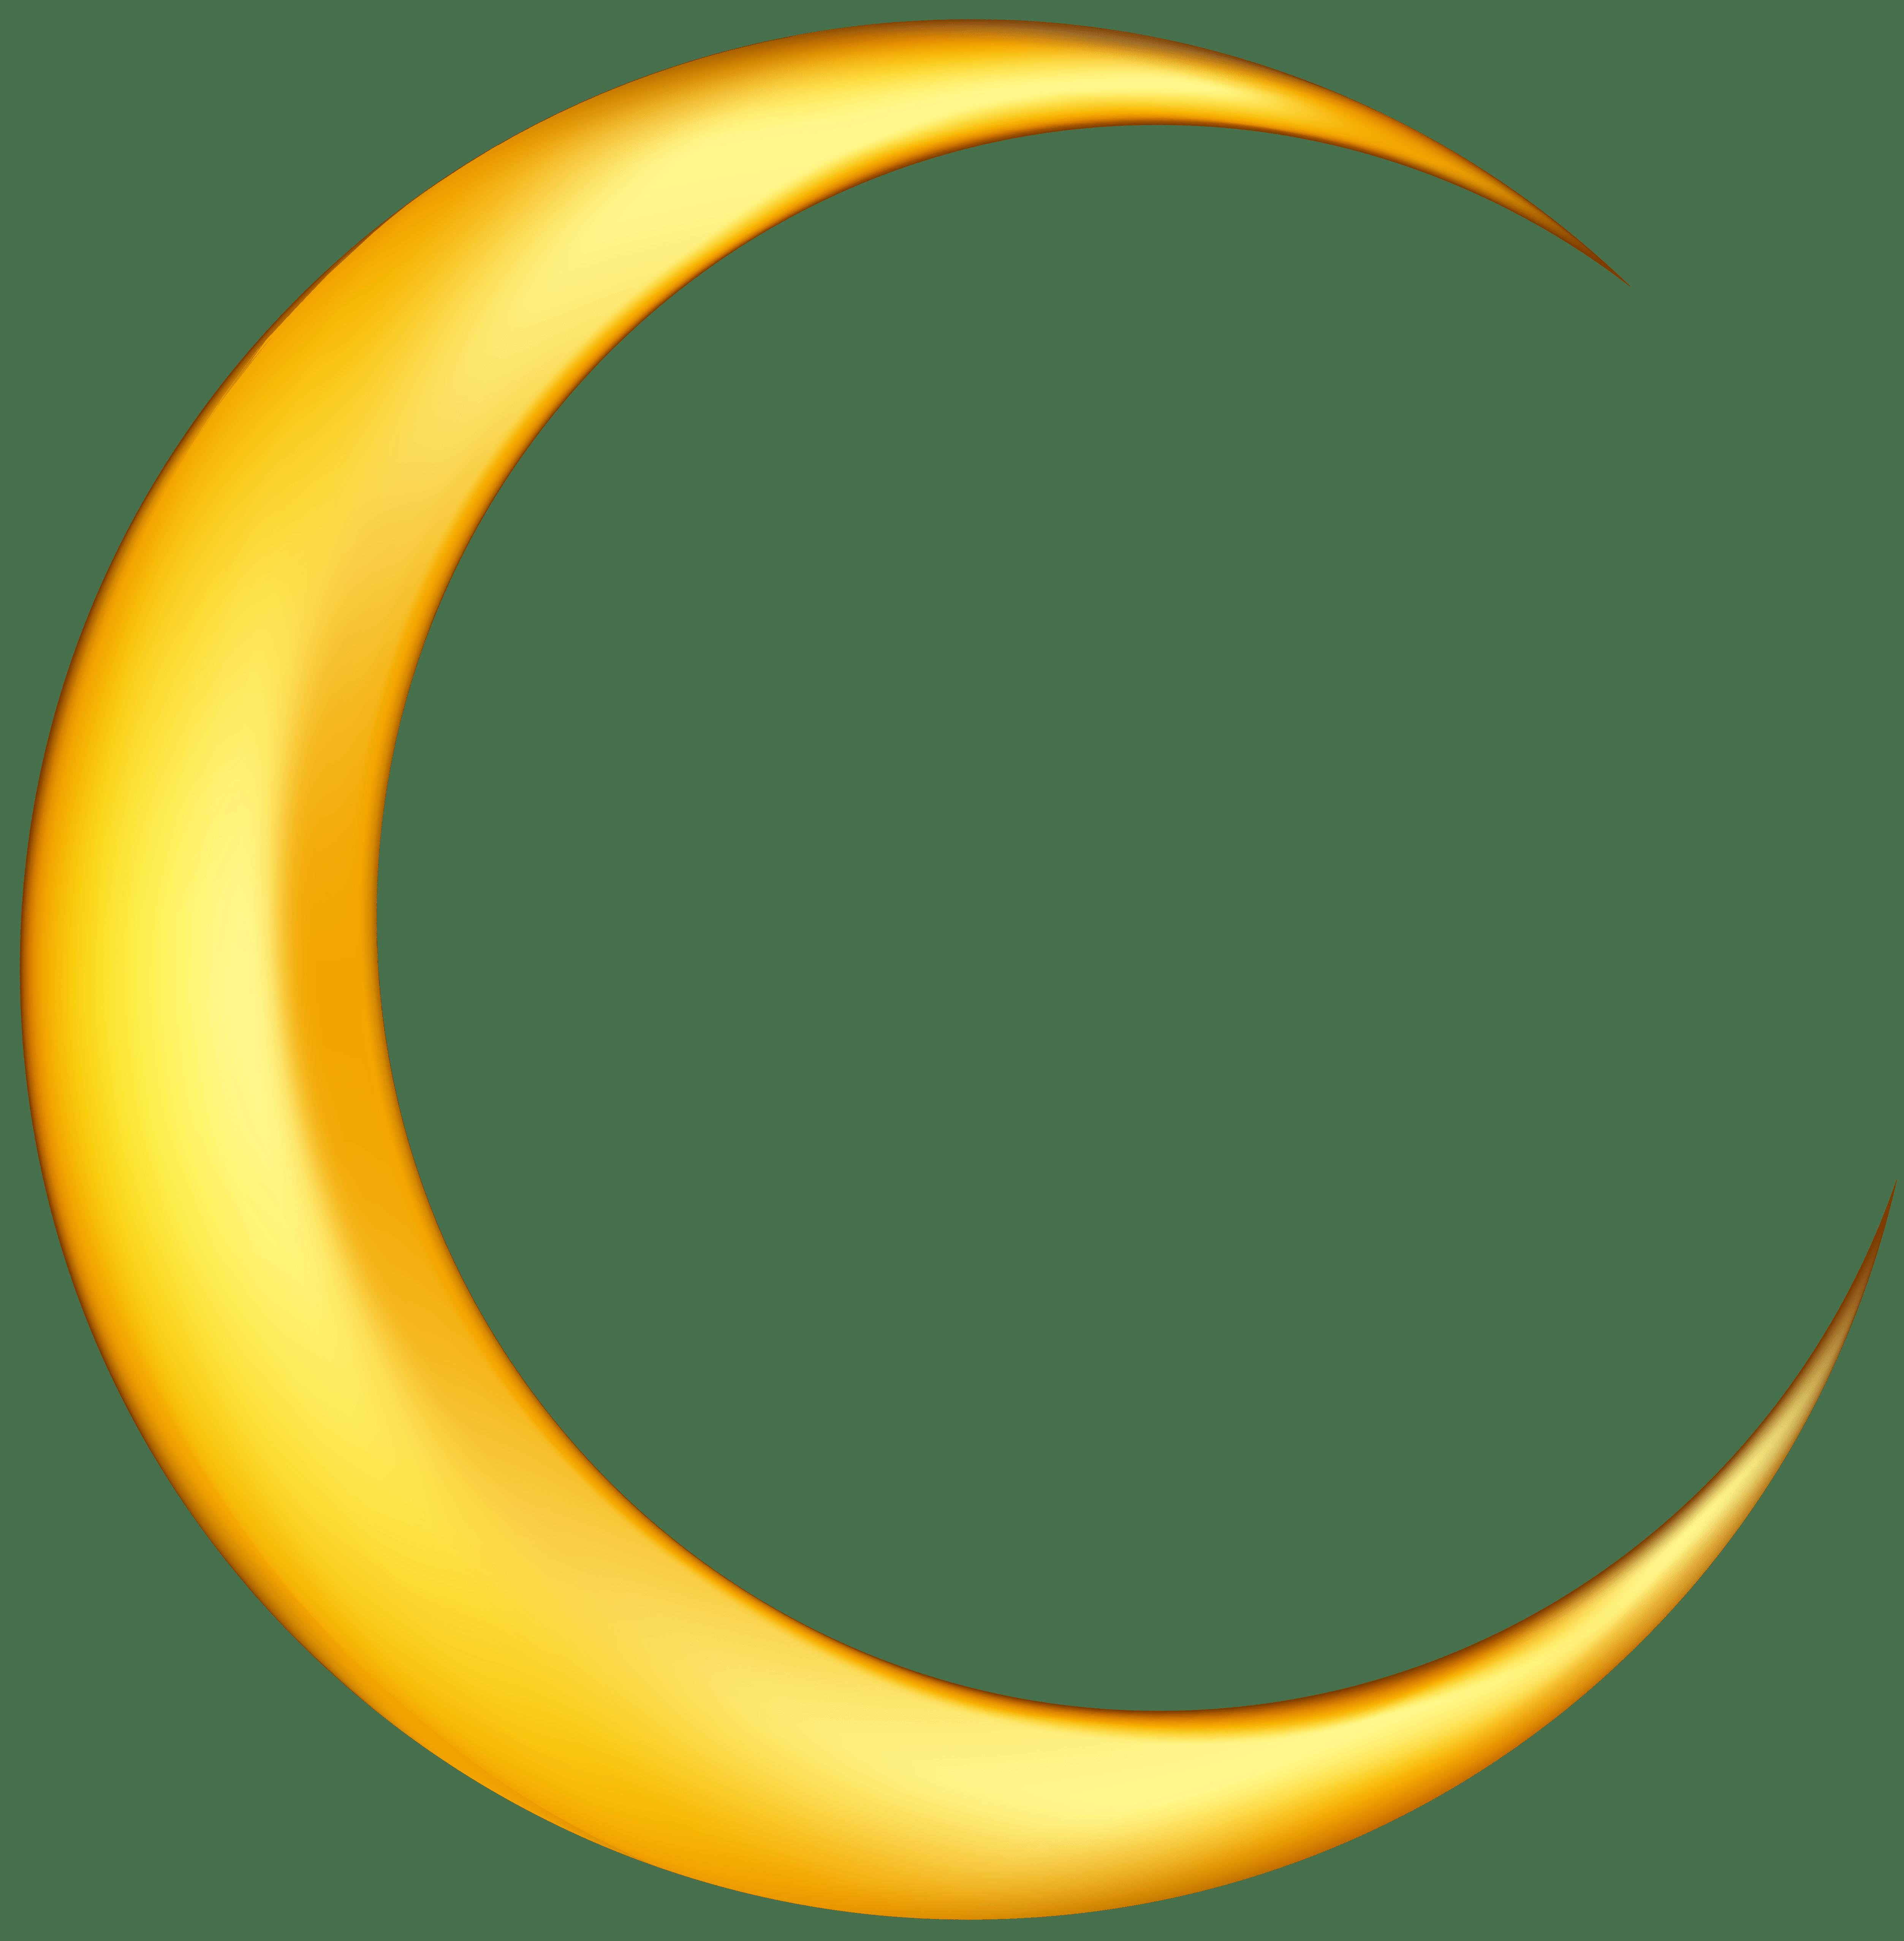 Free Cartoon Moon Cliparts, Download Free Cartoon Moon ... (5011 x 5108 Pixel)